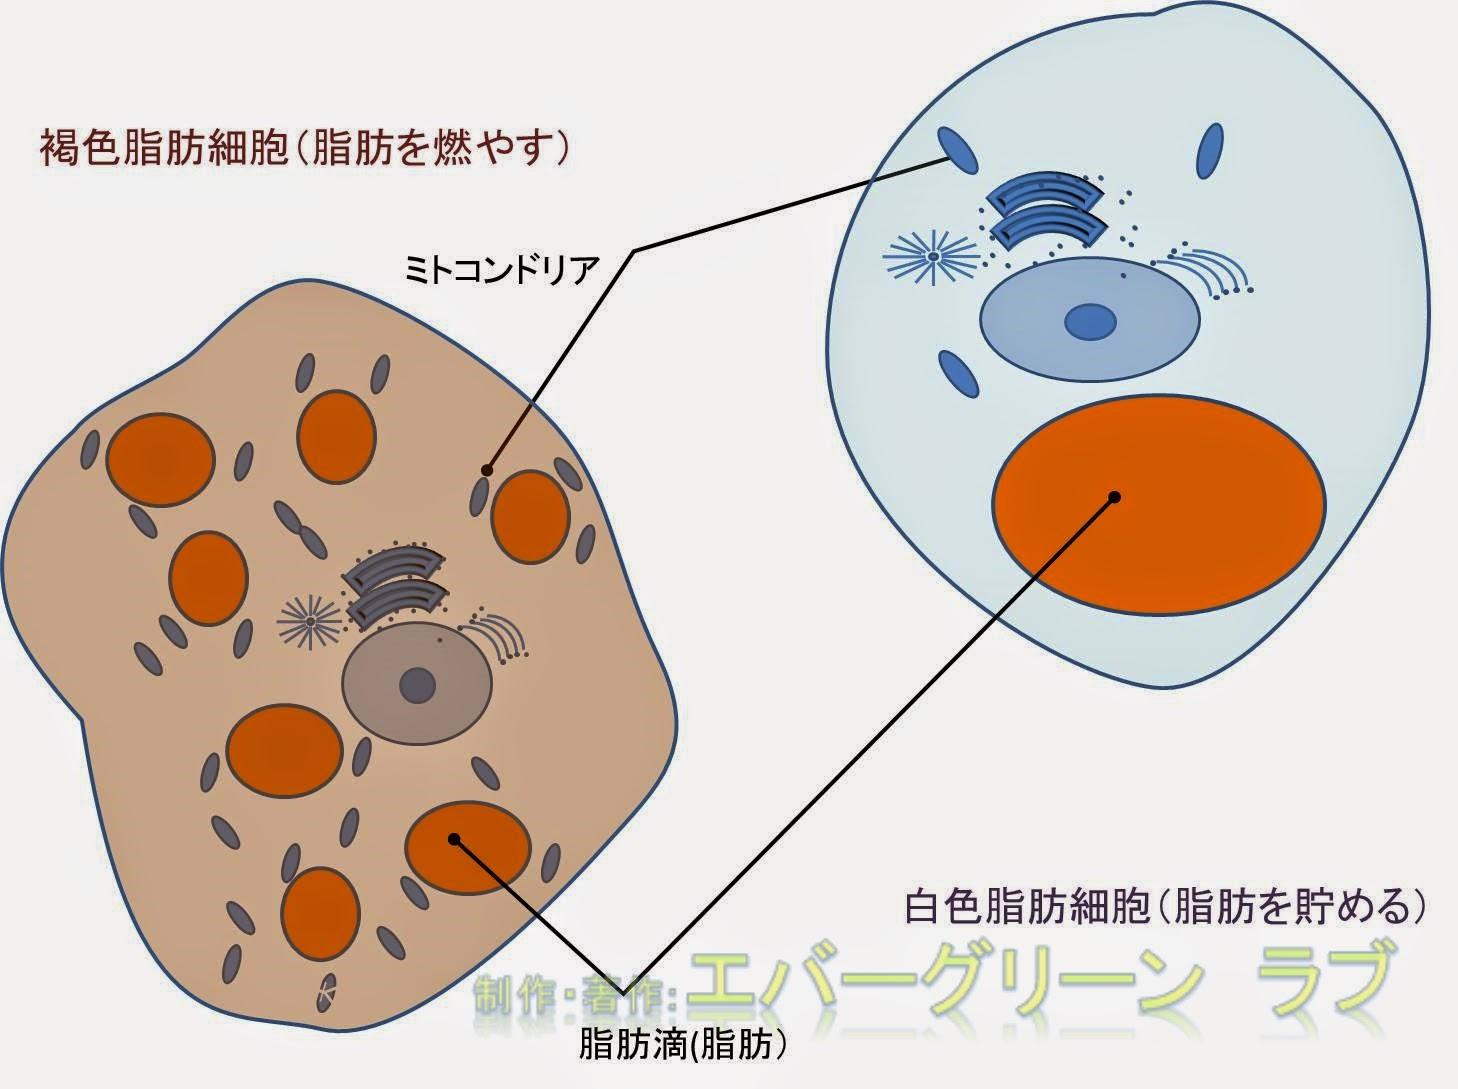 イリシン, ベージュ脂肪細胞, 内臓脂肪, 白色脂肪細胞, 皮下脂肪, 筋トレ, 脂肪組織, 褐色脂肪細胞, 運動,